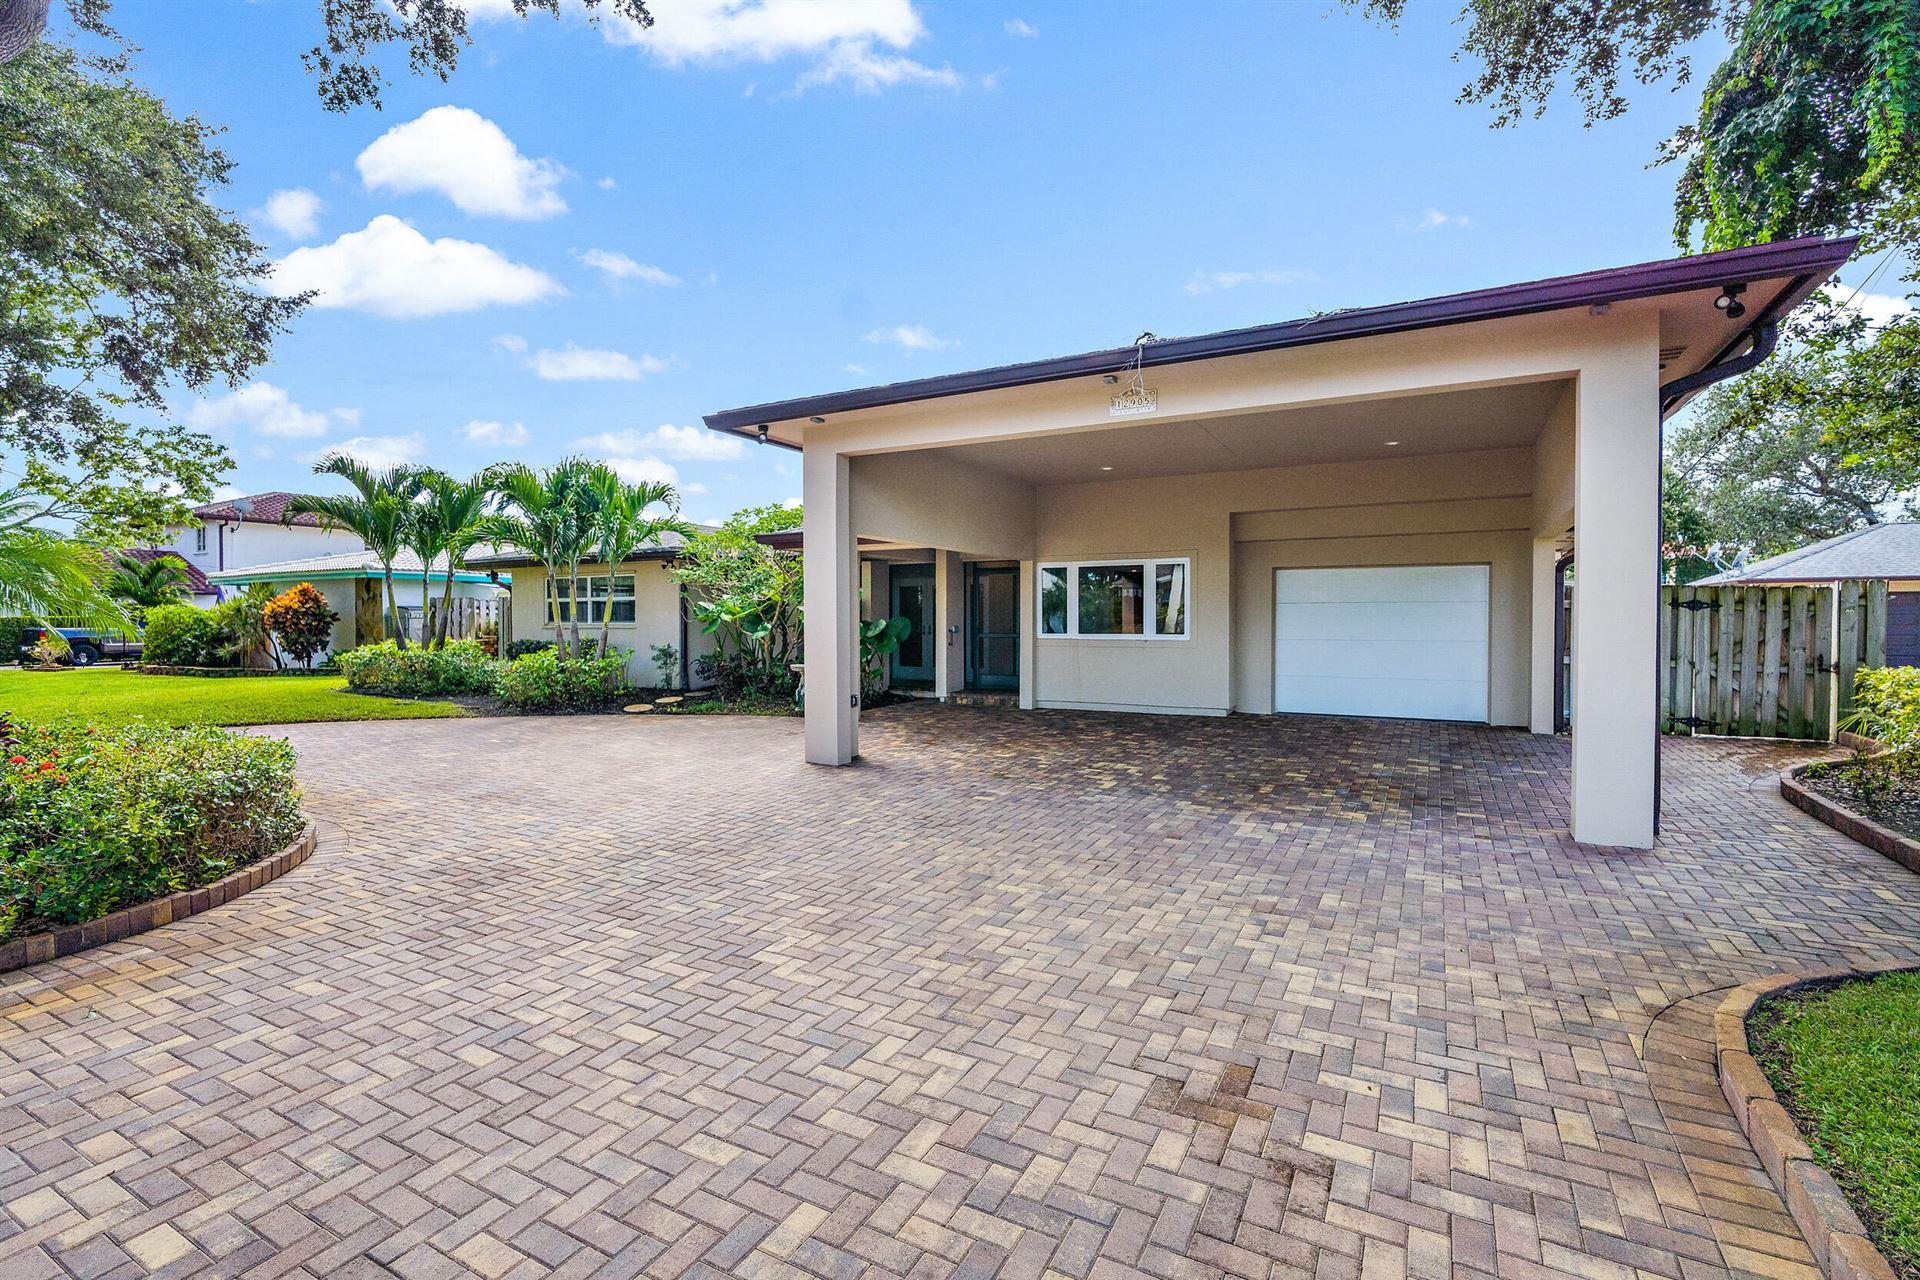 12905 Inshore Drive, West Palm Beach, FL 33410 - MLS#: RX-10746396